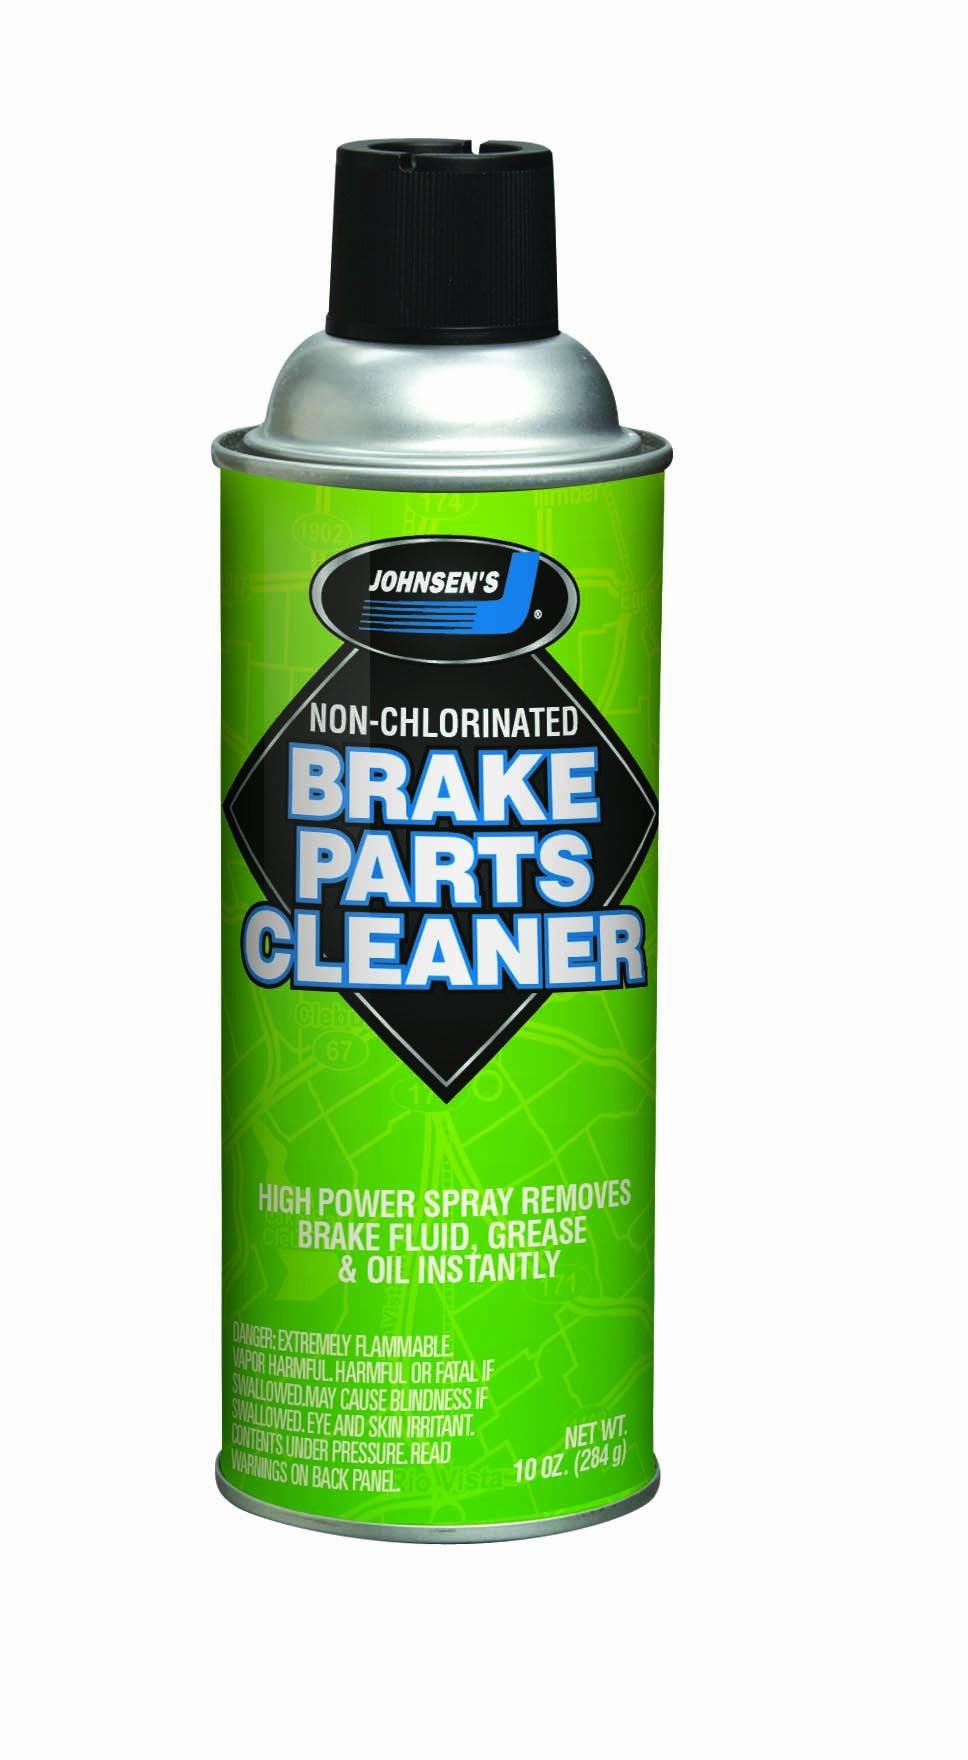 Johnsen's 2418NC-12PK VOC Compliant Non-Chlorinated Brake Cleaner - 10 oz, (Pack of 12)